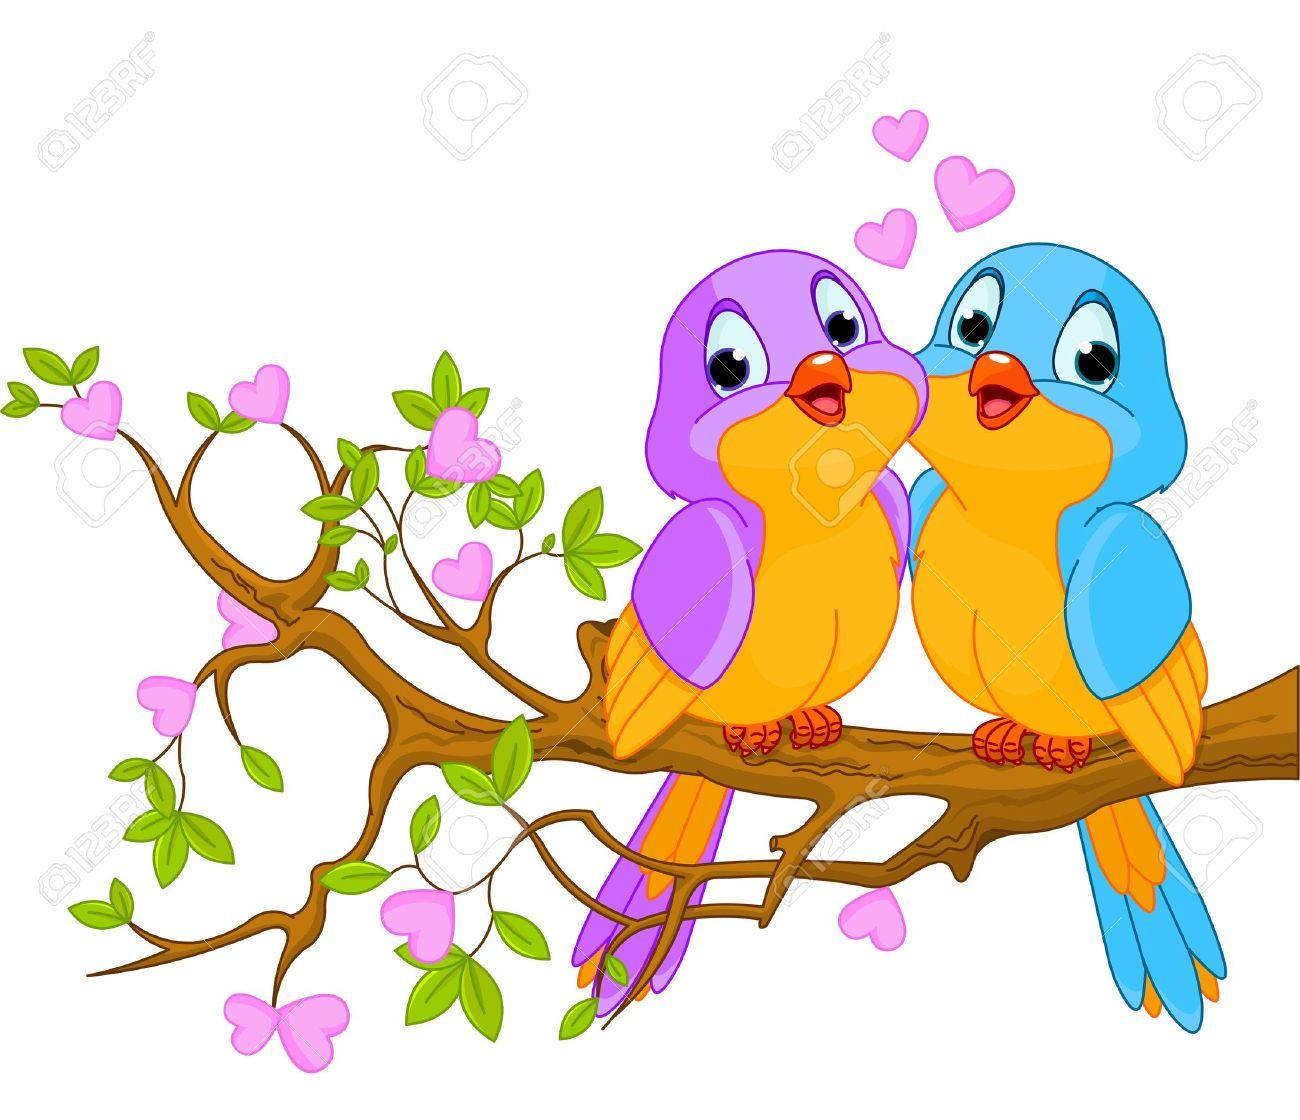 592 lovebird stock vector illustration and royalty free lovebird clipart rh 123rf com lovebird clipart love bird clipart silhouette